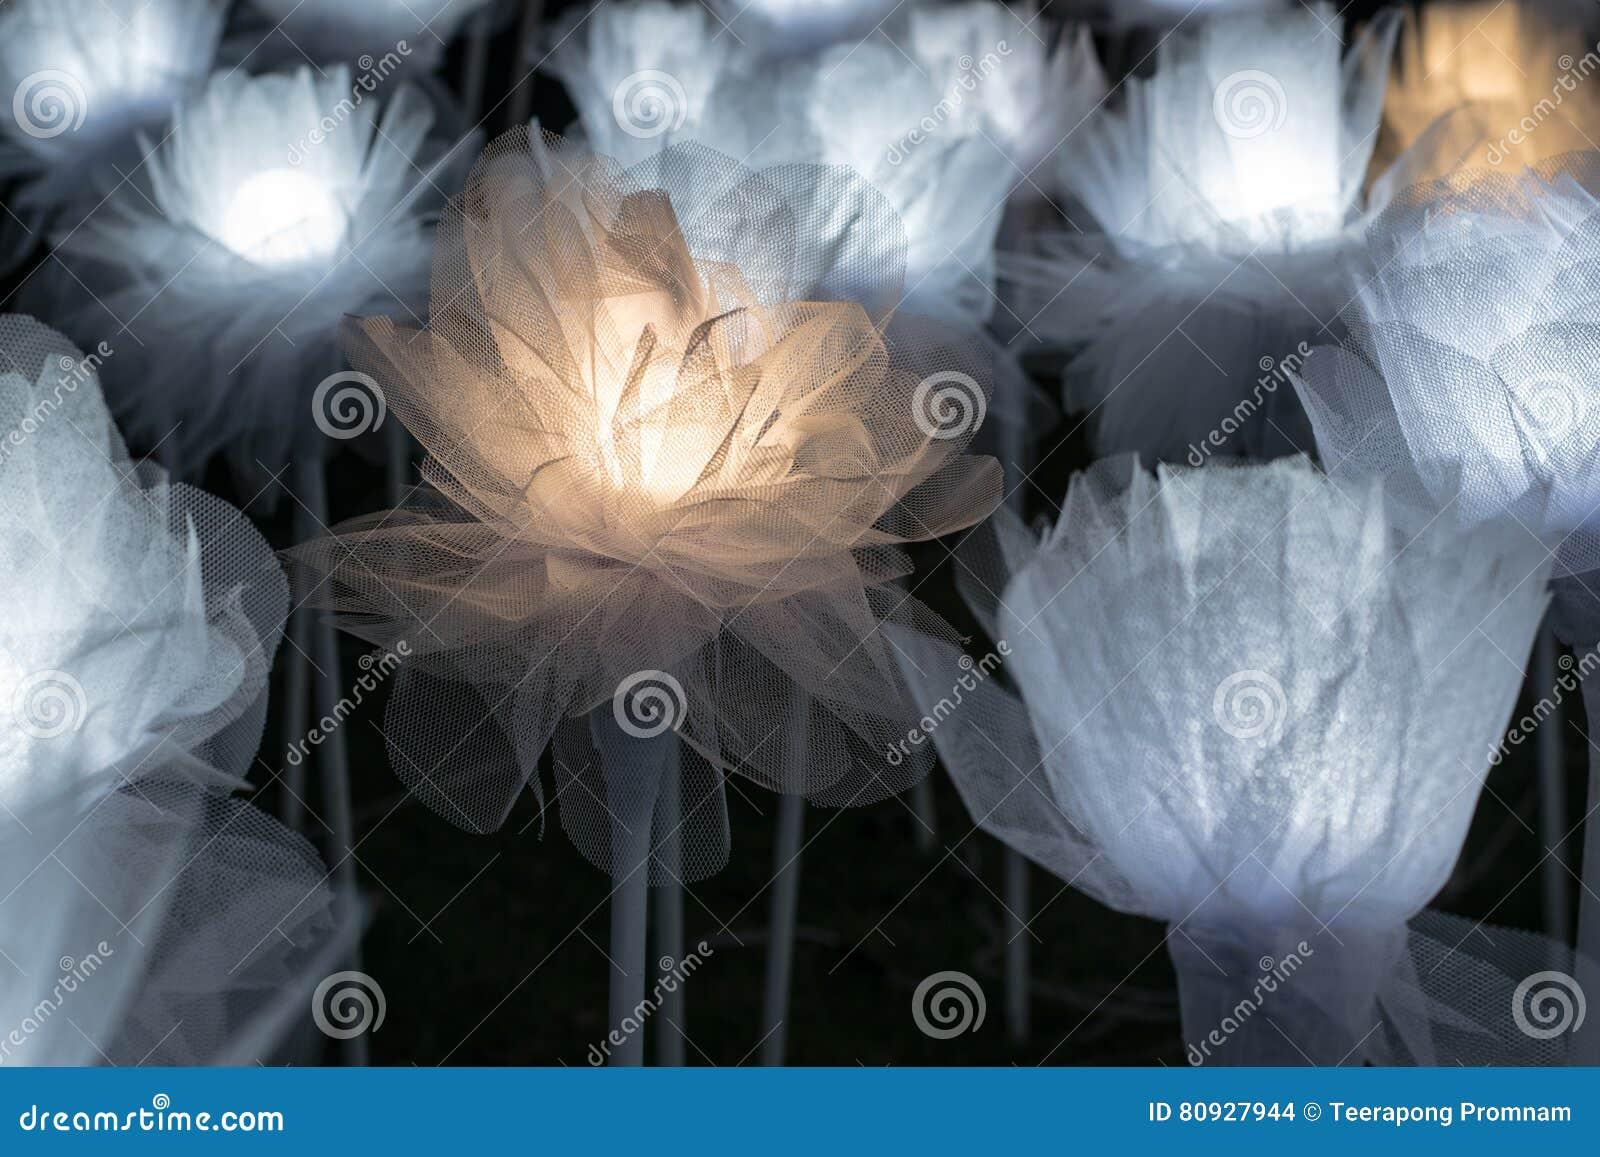 A Lot Of Lit LED Rose Flowers At The Dongdaemun Design Plaza In UD - Lit design a led